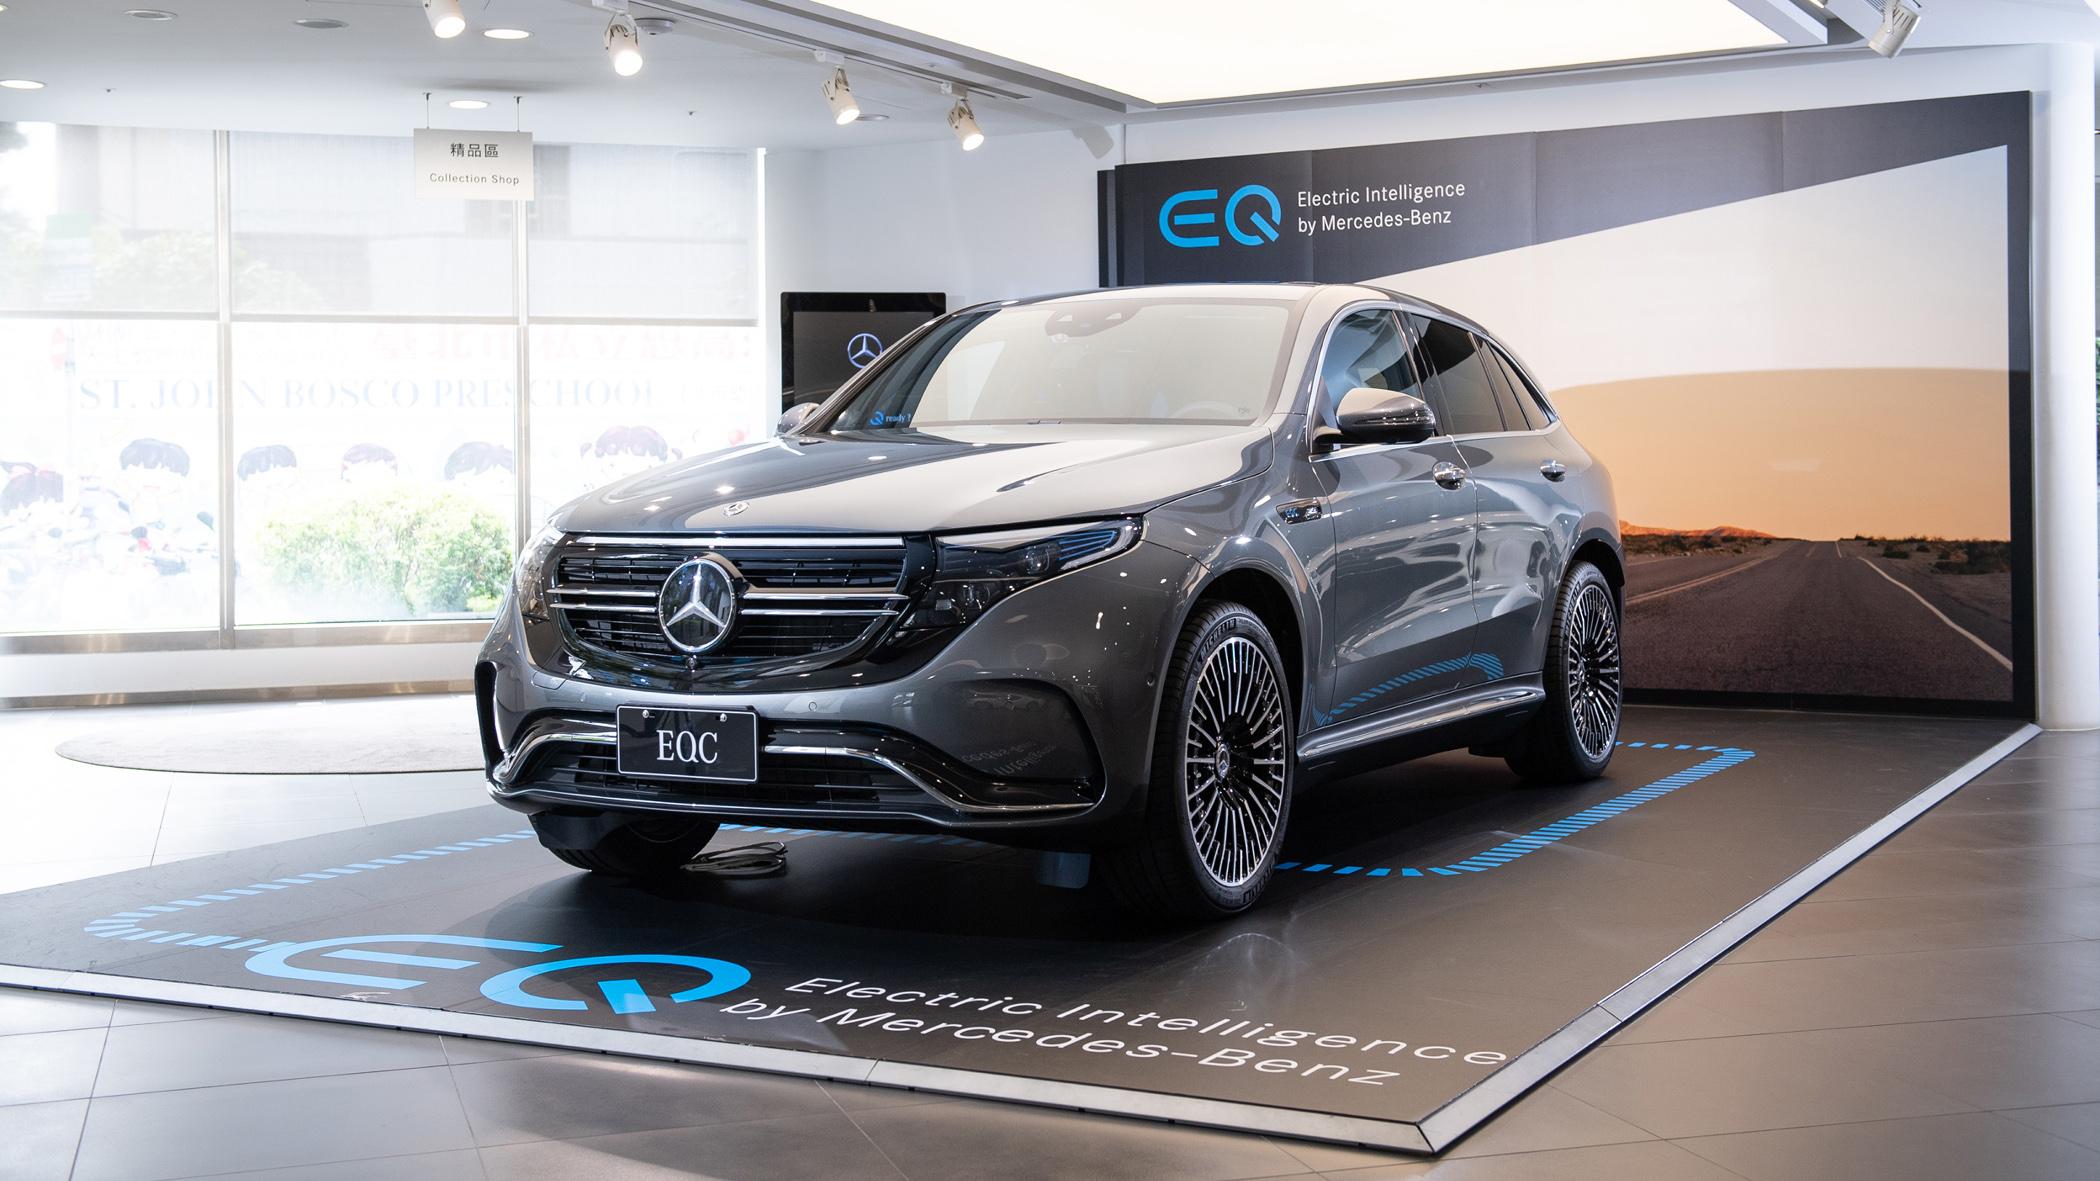 Mercedes-Benz 首款純電休旅 EQC 330 萬起正式進駐展間,多元購車方案這裡看!